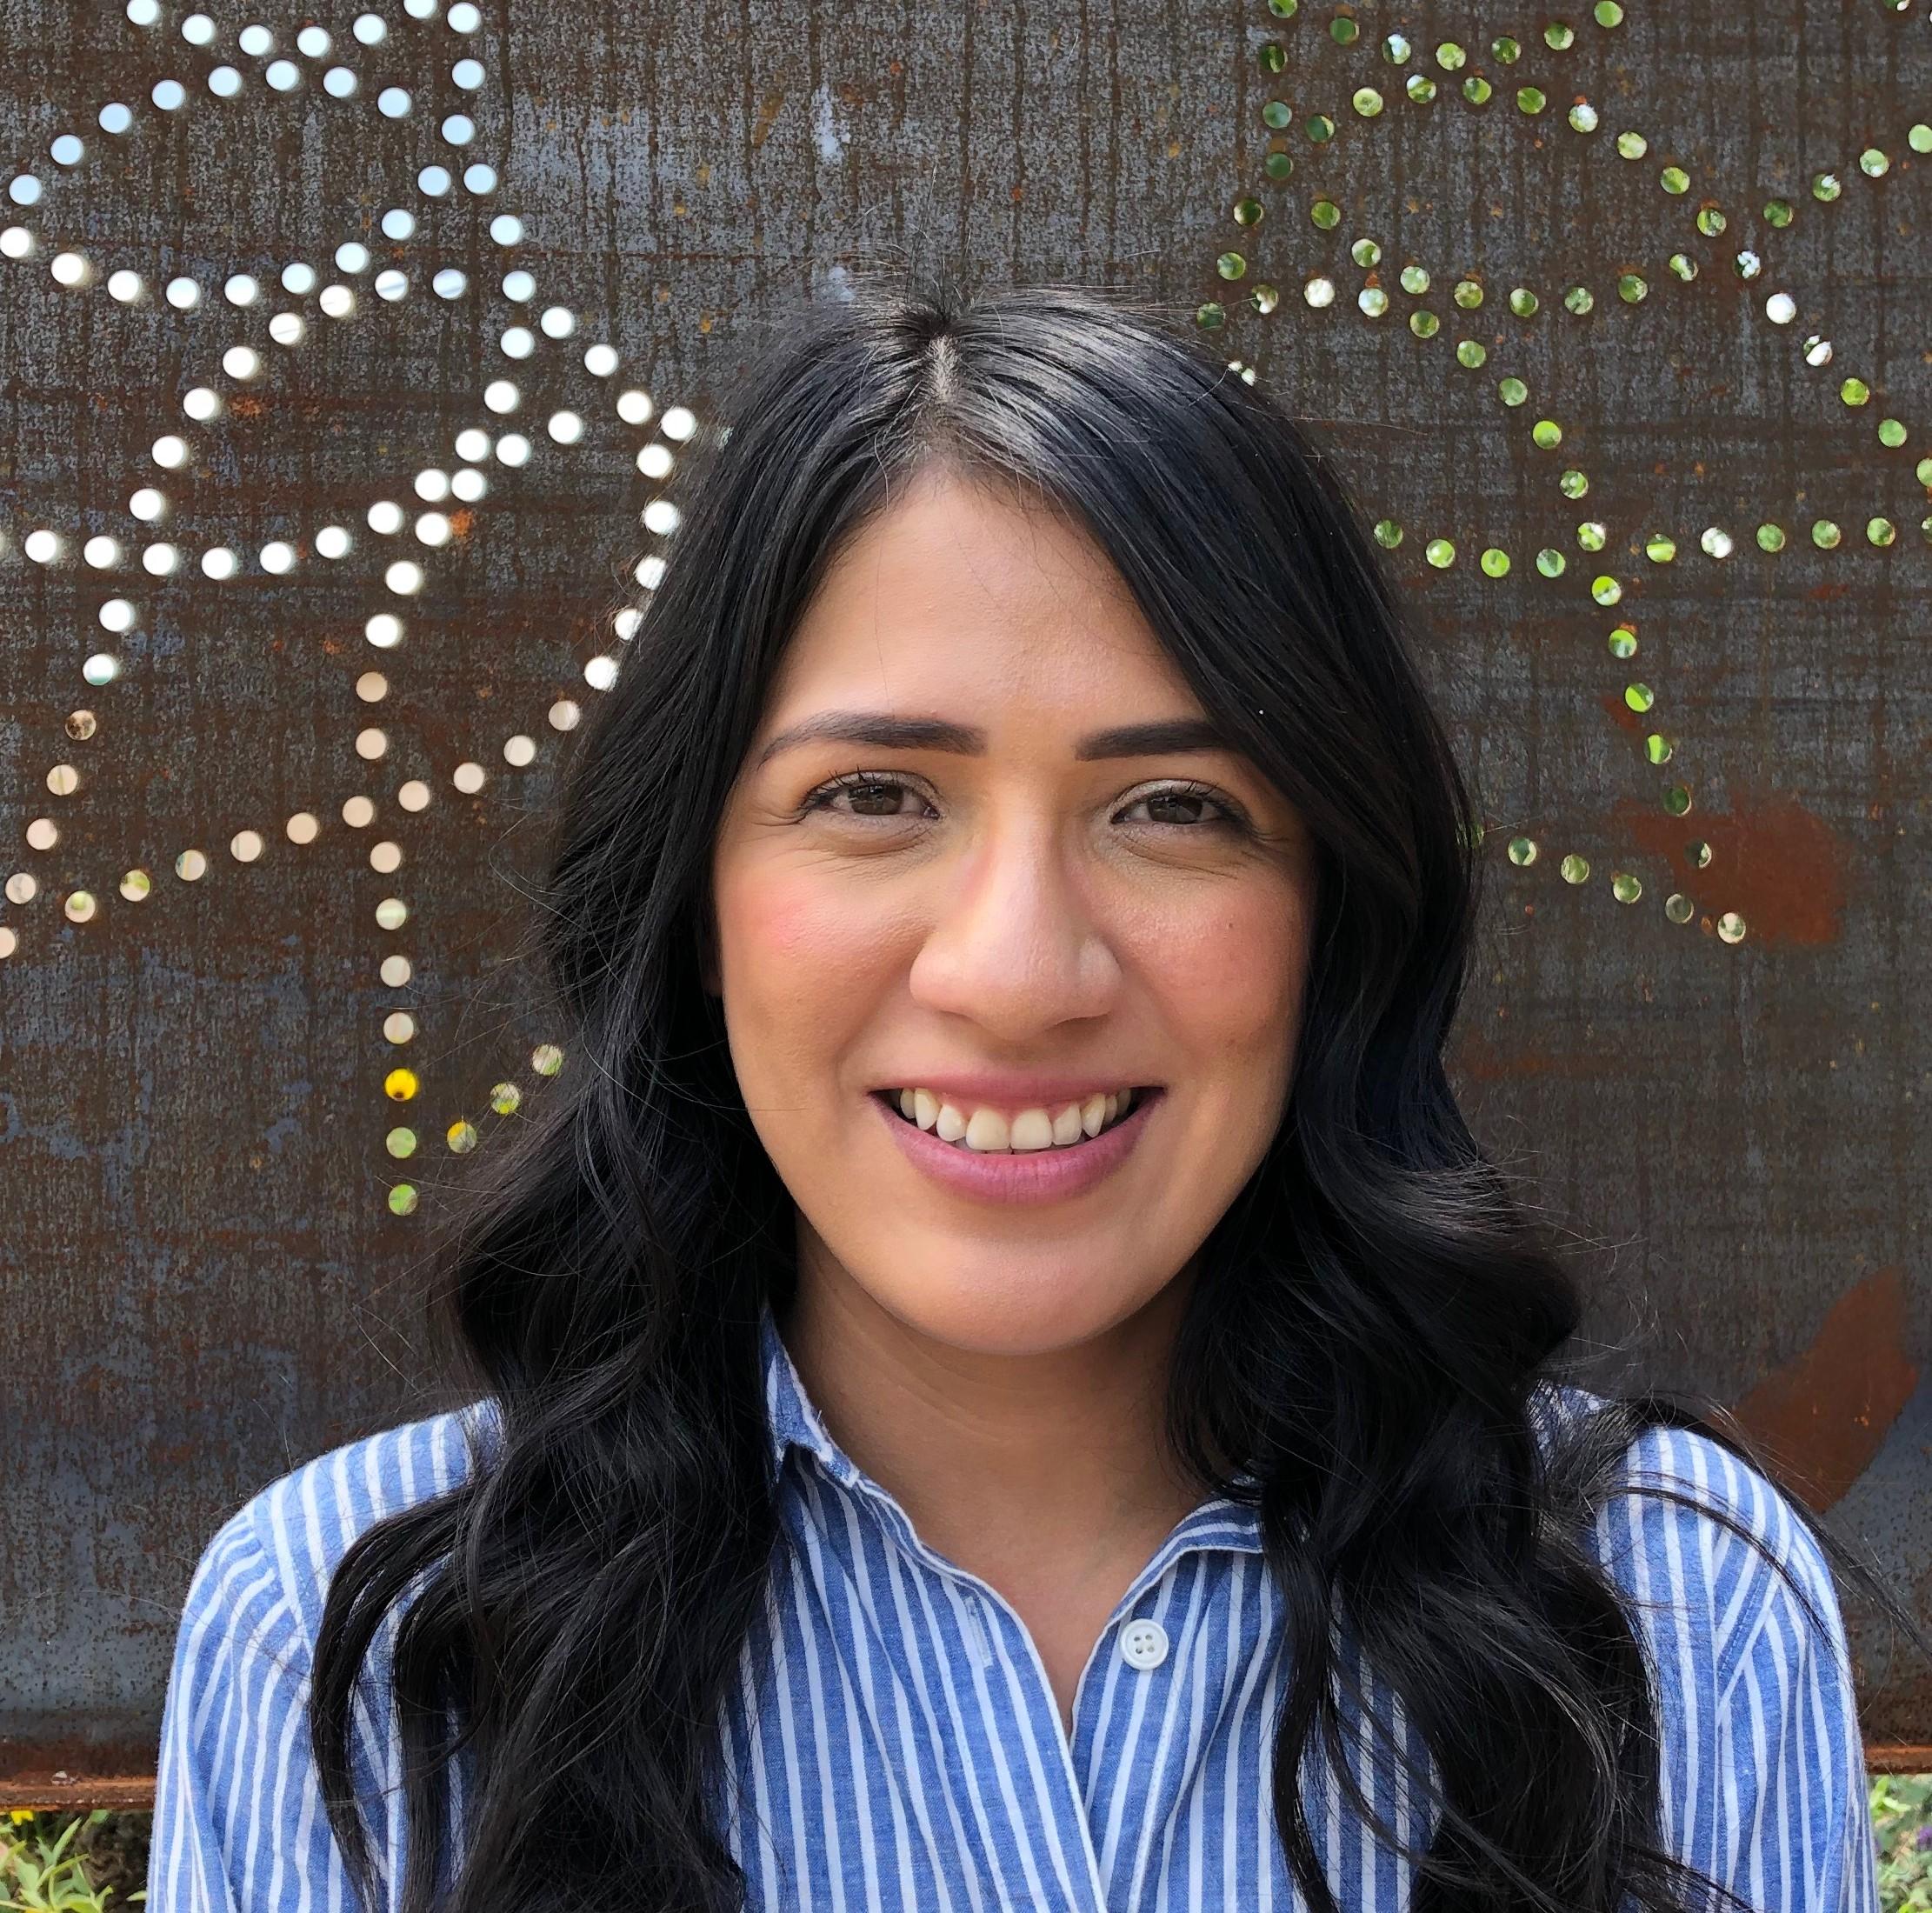 Lissette Guerrero